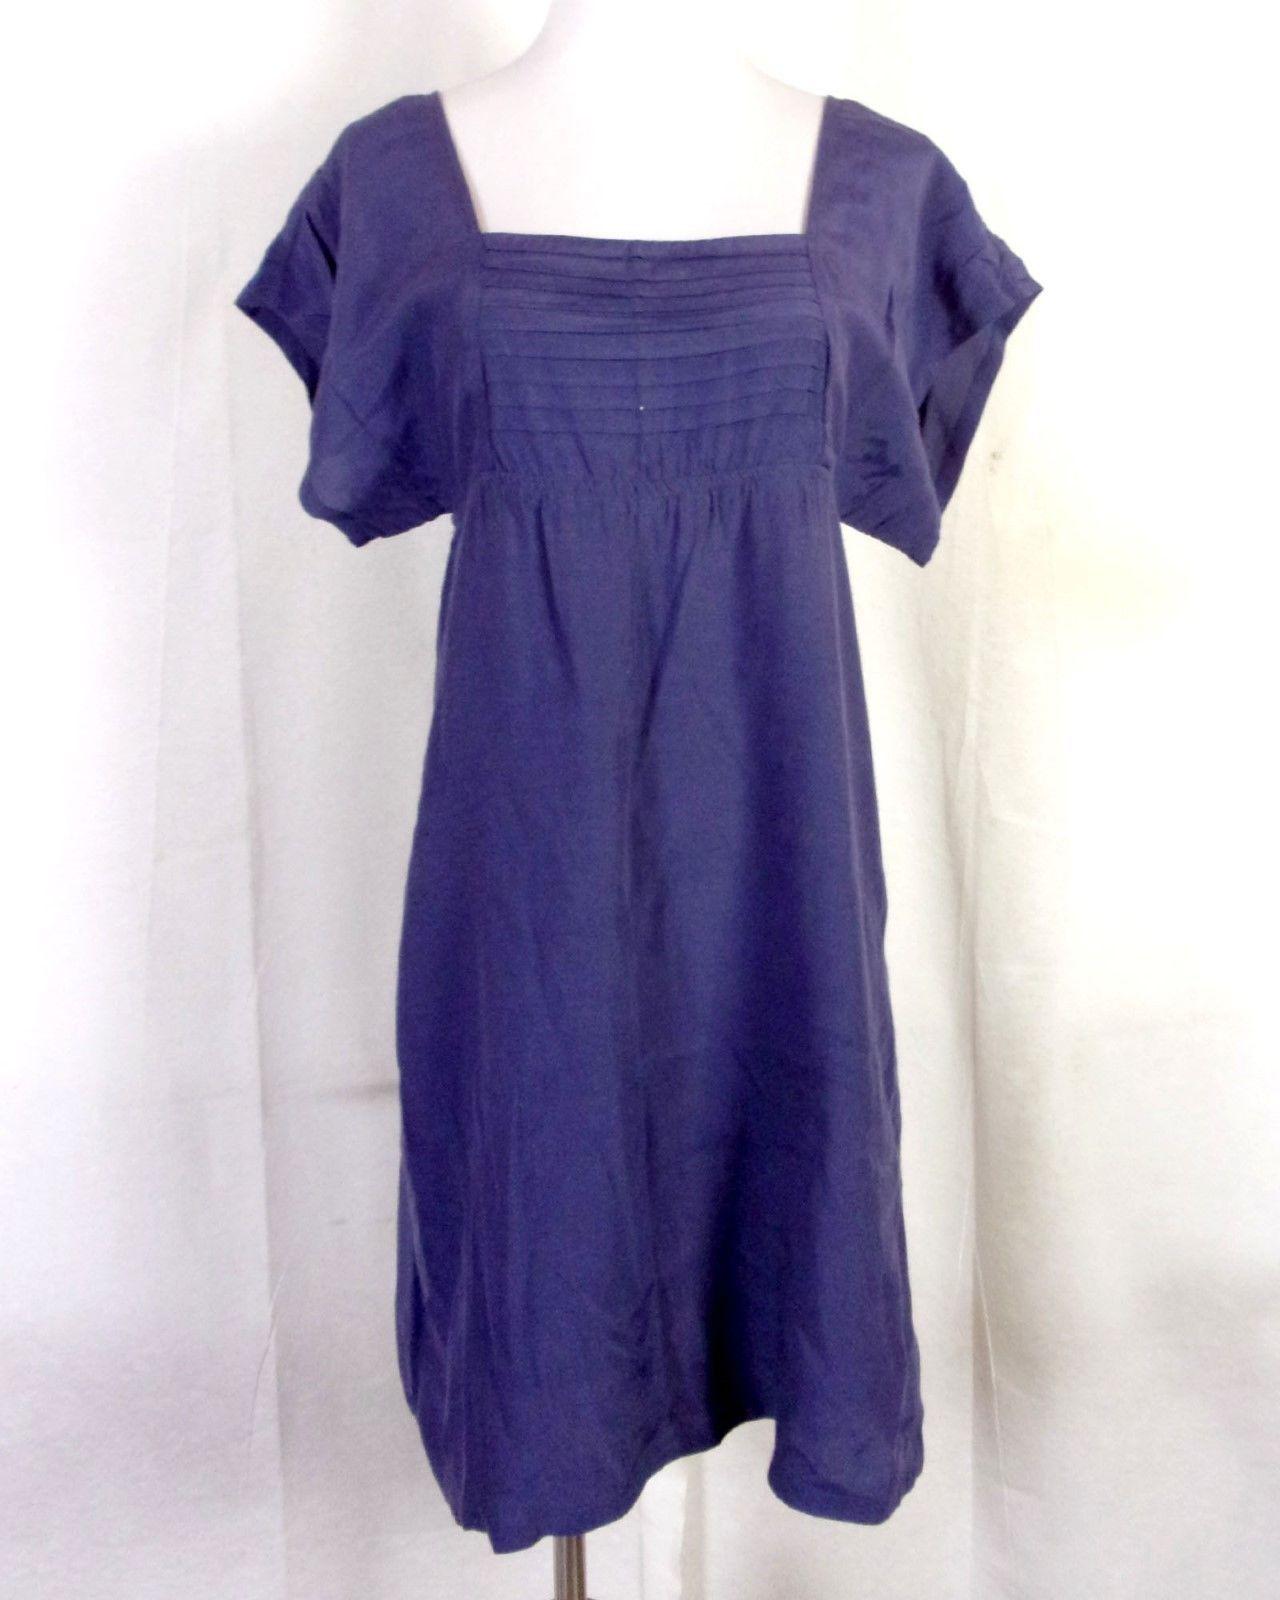 674cd285a9372 euc Anthropologie MAEVE Blue Tunic Dress Minidress She Who is Beautiful  Rayon S - $33.83